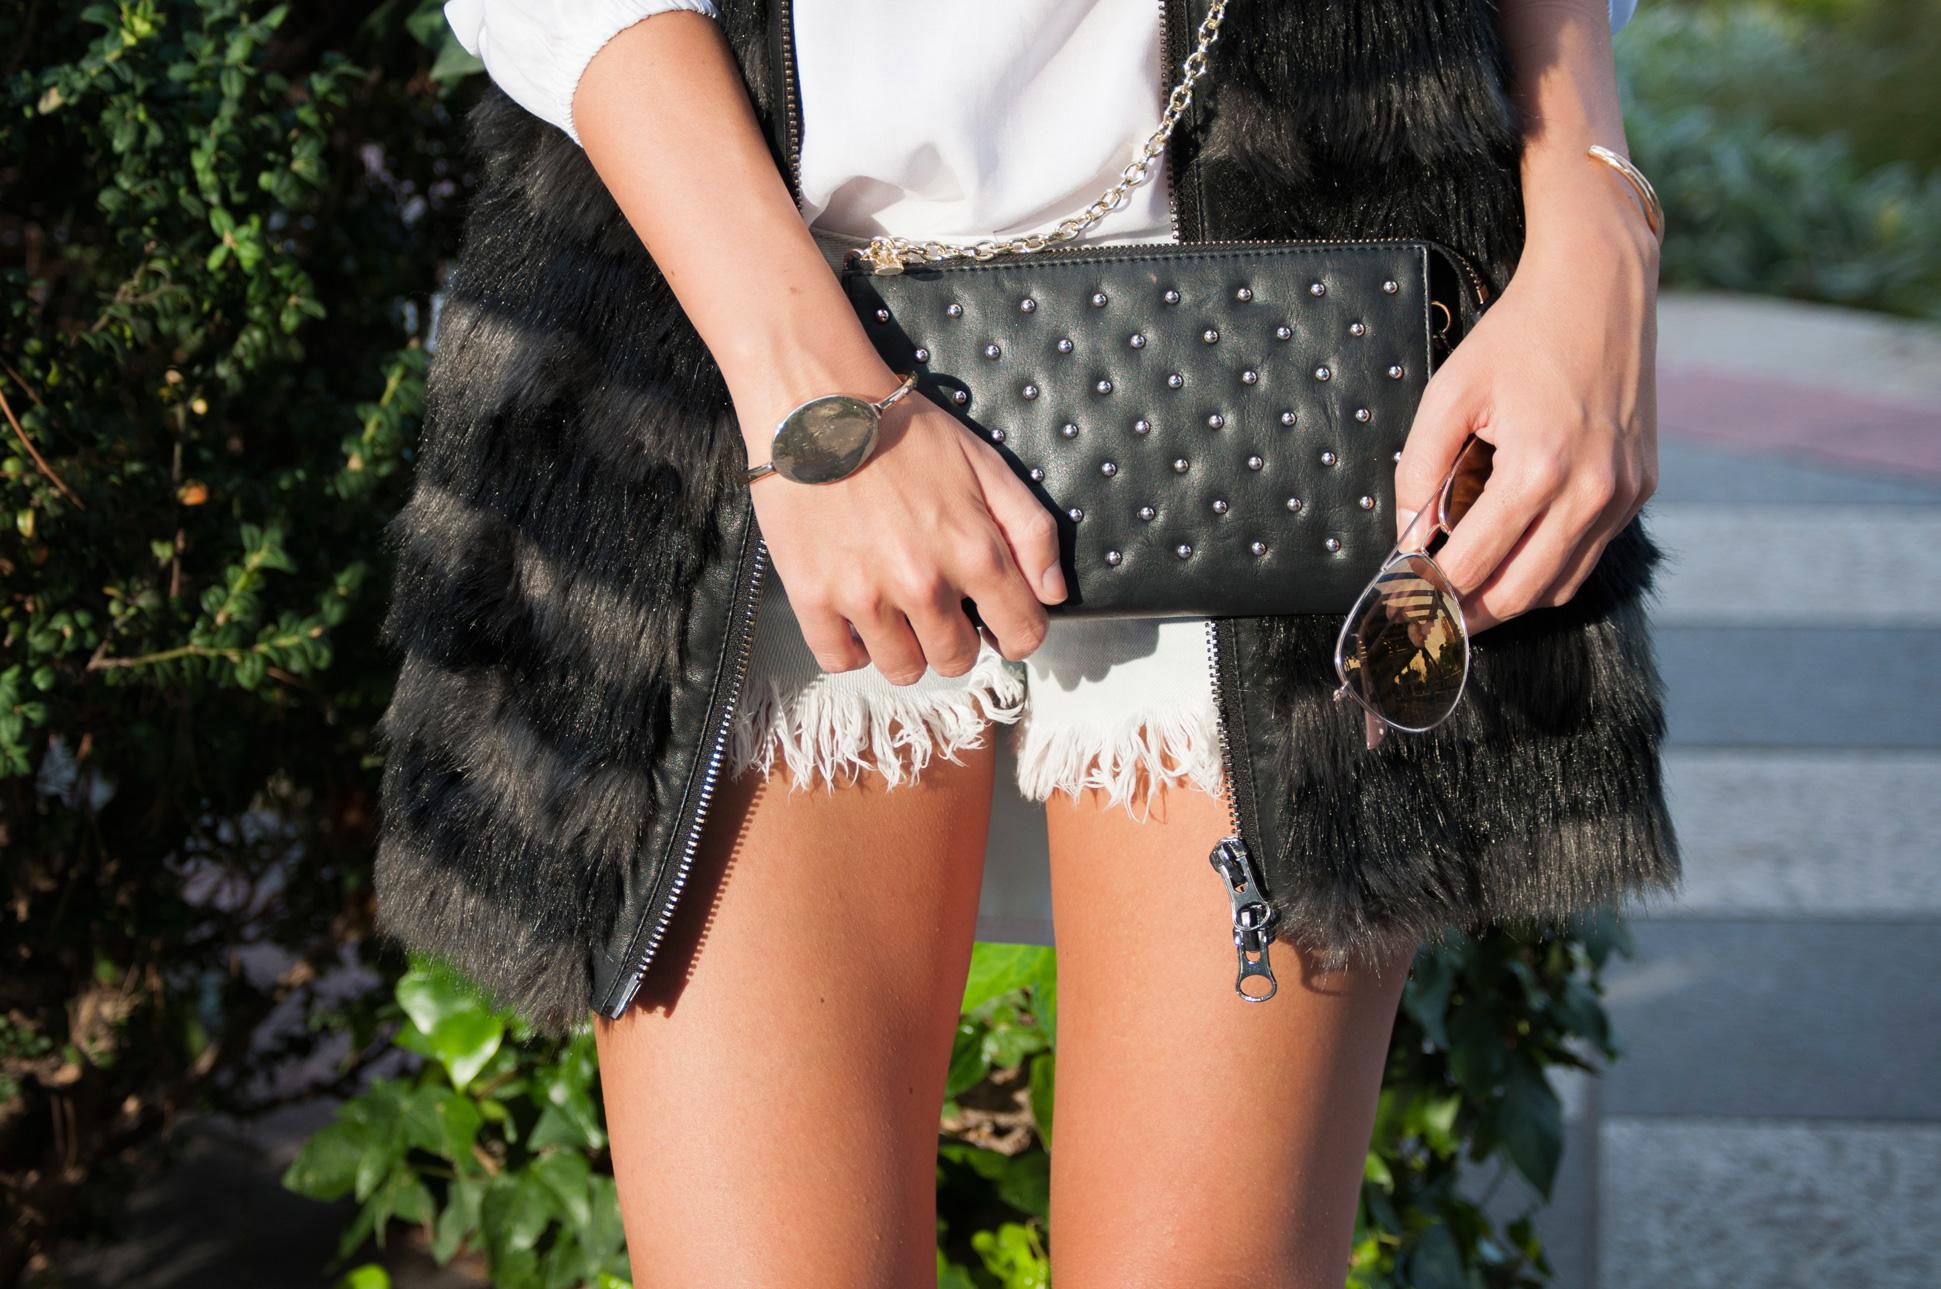 Fall 2015 Trends: Long Fur Vest / Tendencias Otoño 2015: Chaleco Largo de Pelo